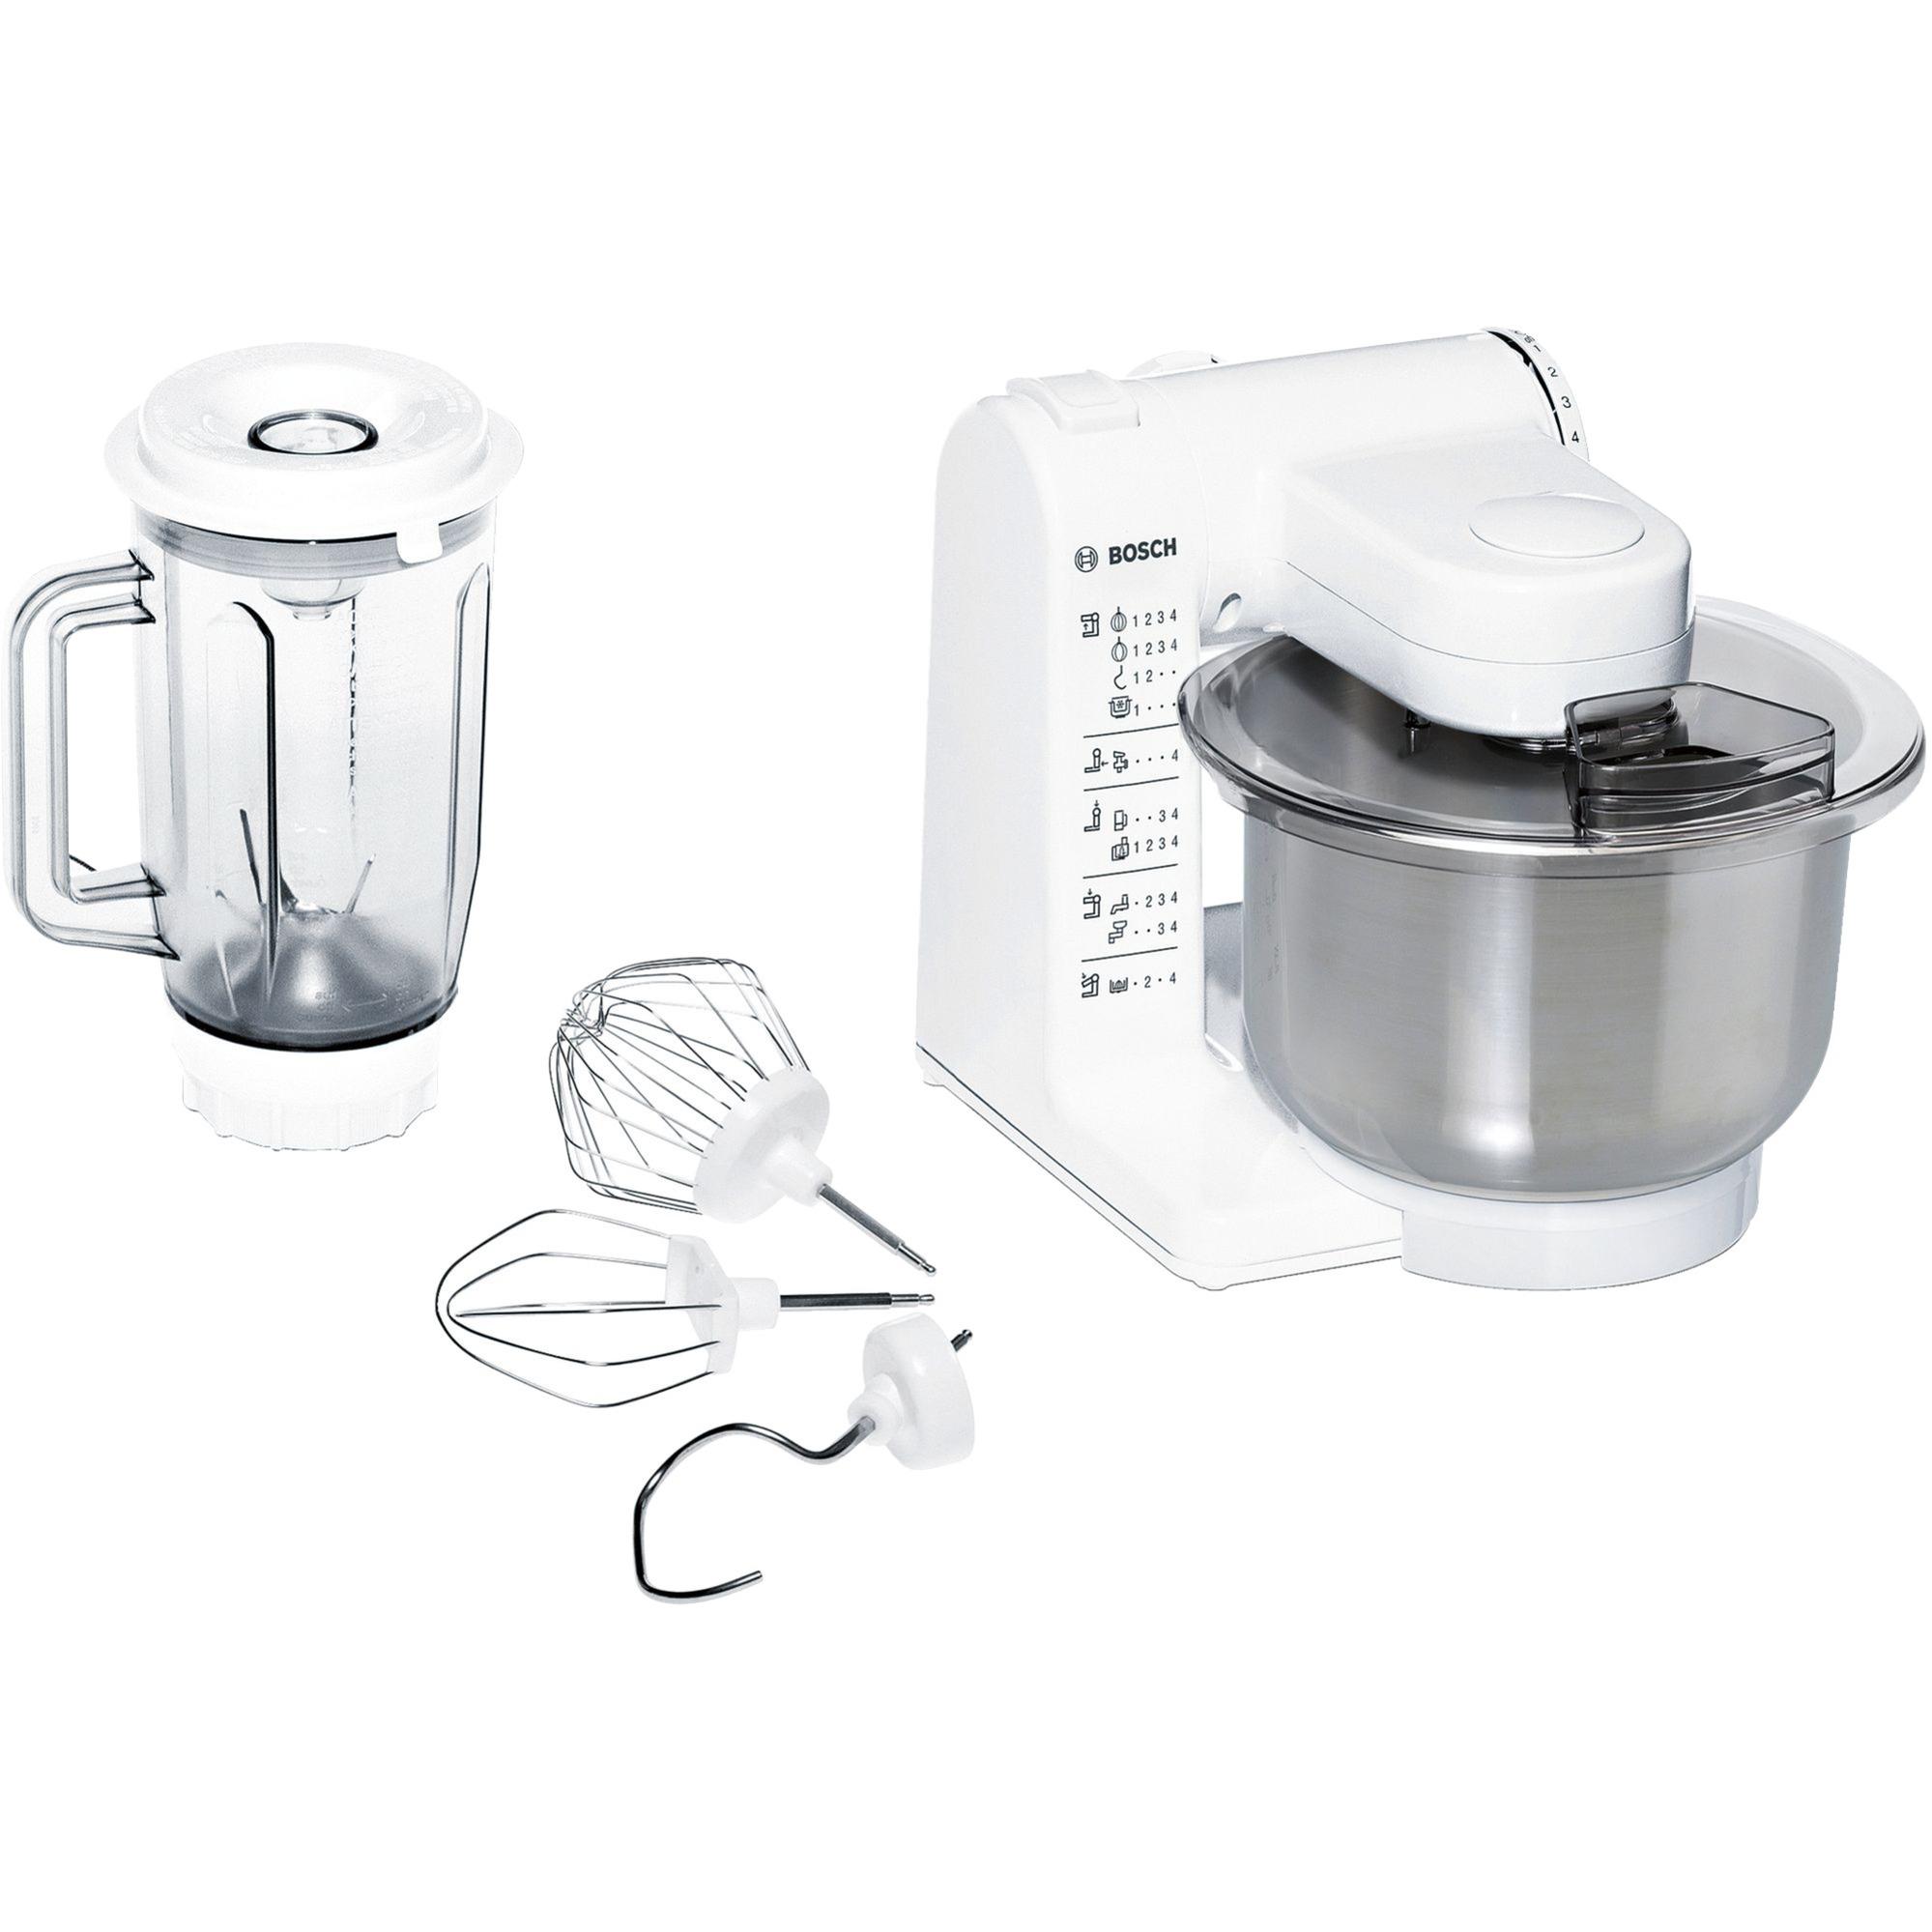 MUM4409 500W 3.9L Color blanco robot de cocina